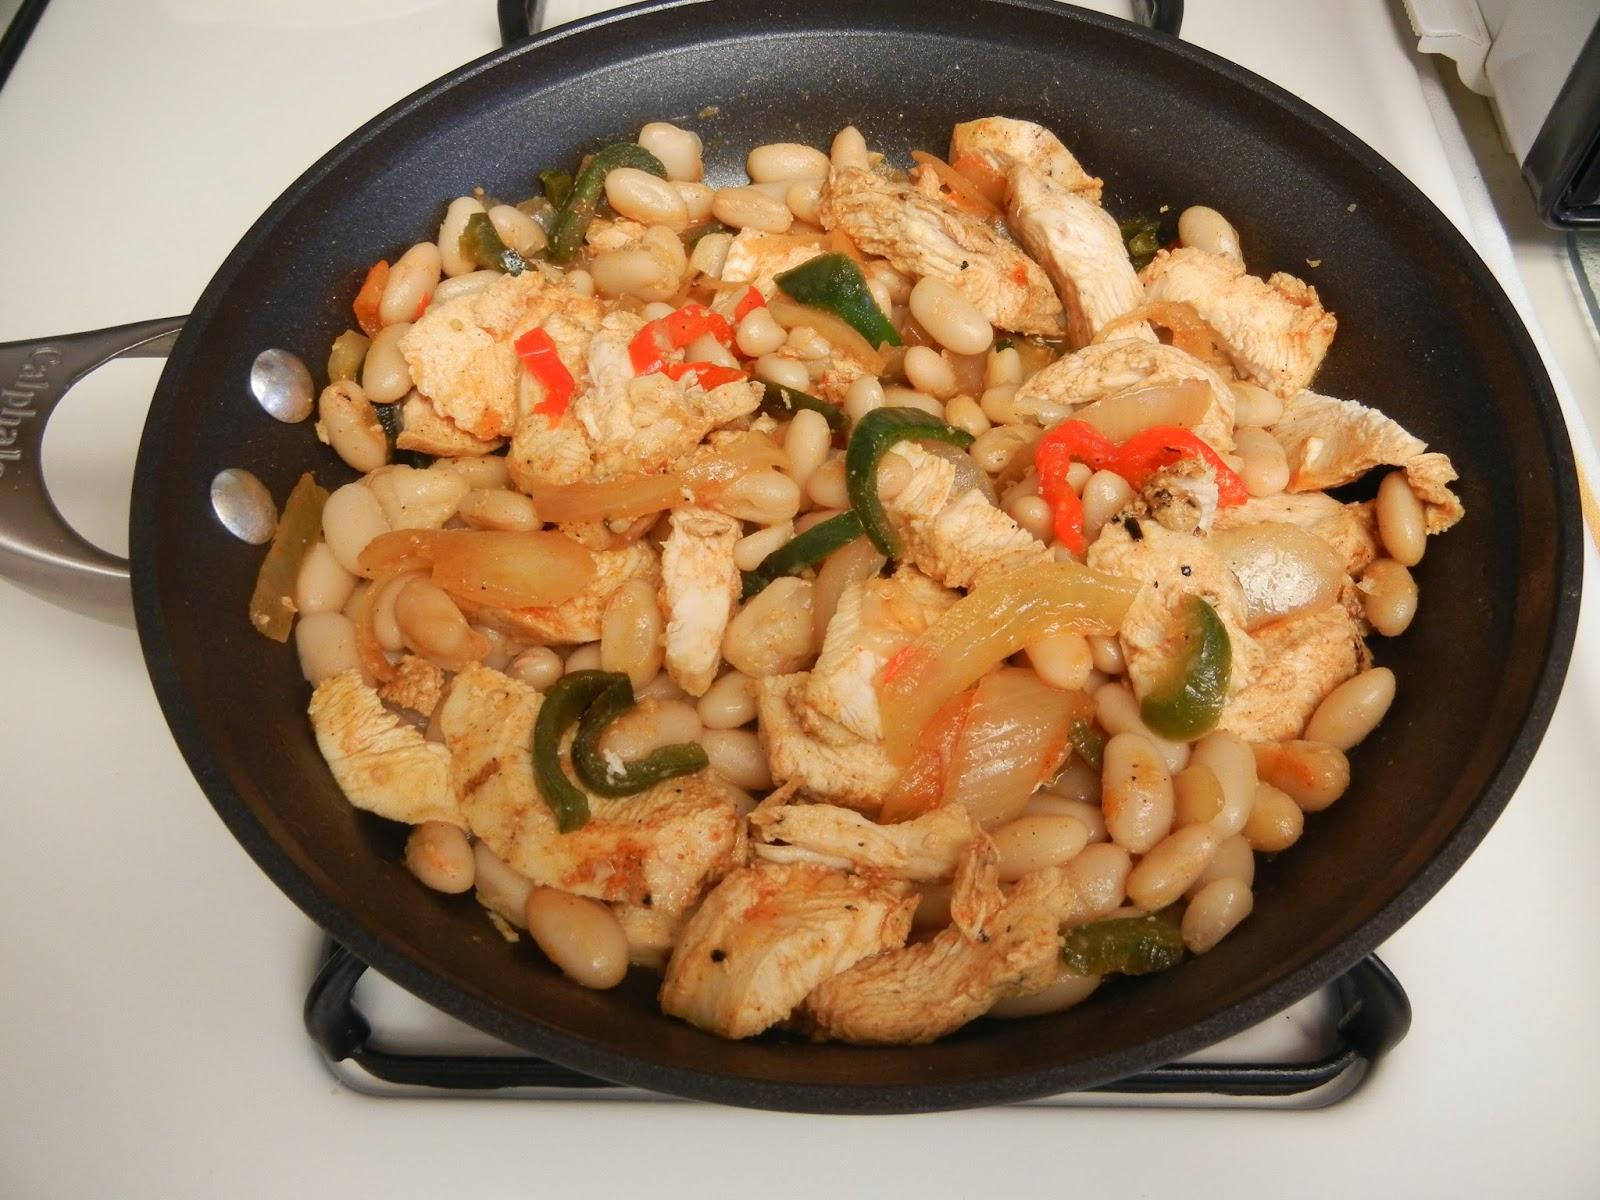 Chicken+Asada+with+Beans+Trader+Joes+Eggface Weight Loss Recipes New Product Alert   Trader Joes (Joses) Chicken Asada